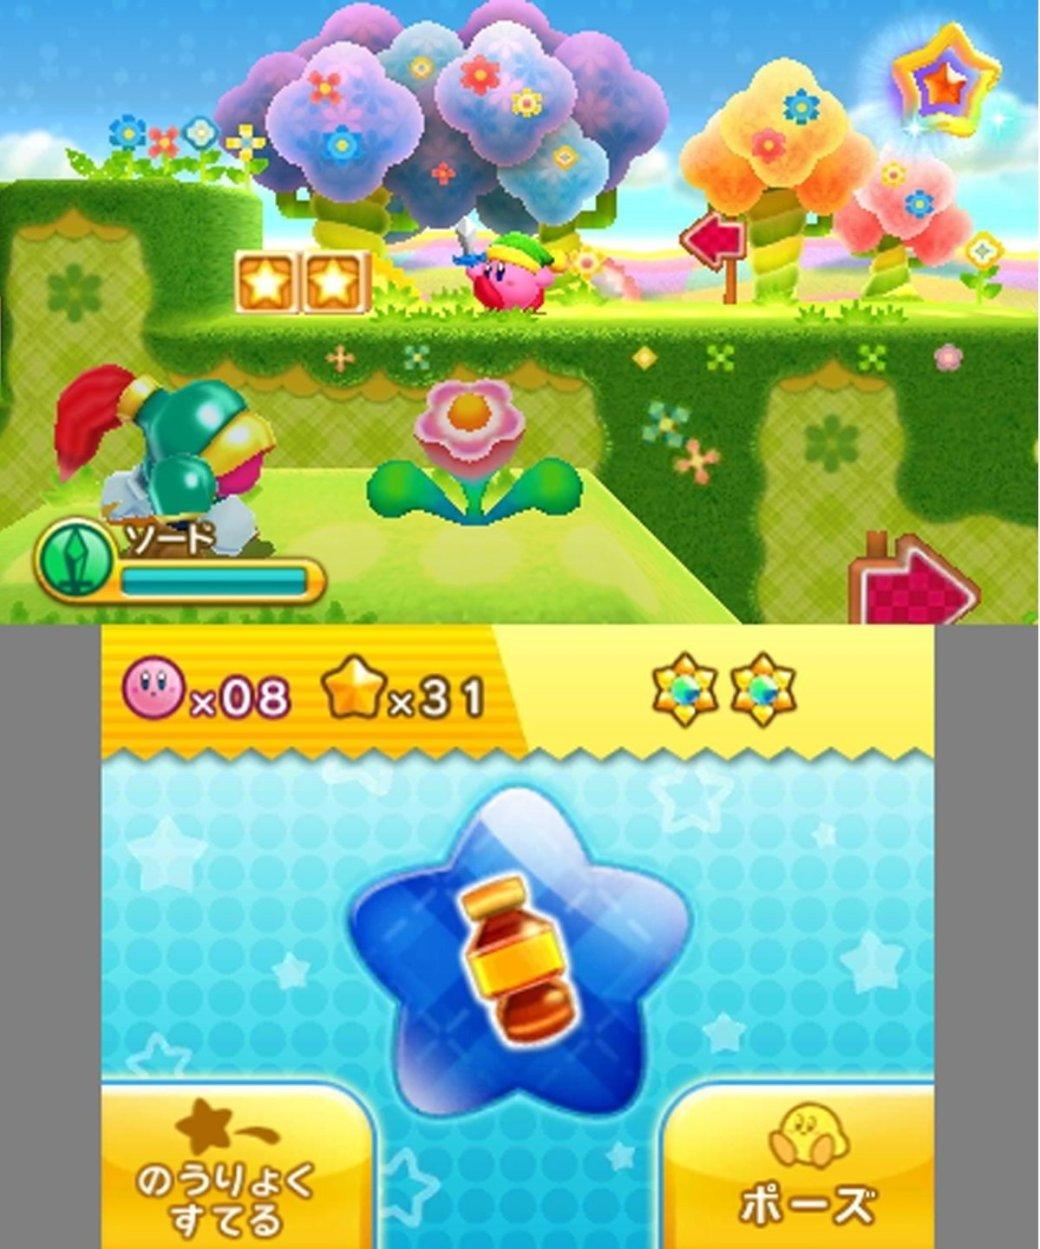 Рецензия на Kirby: Triple Deluxe | Канобу - Изображение 11723